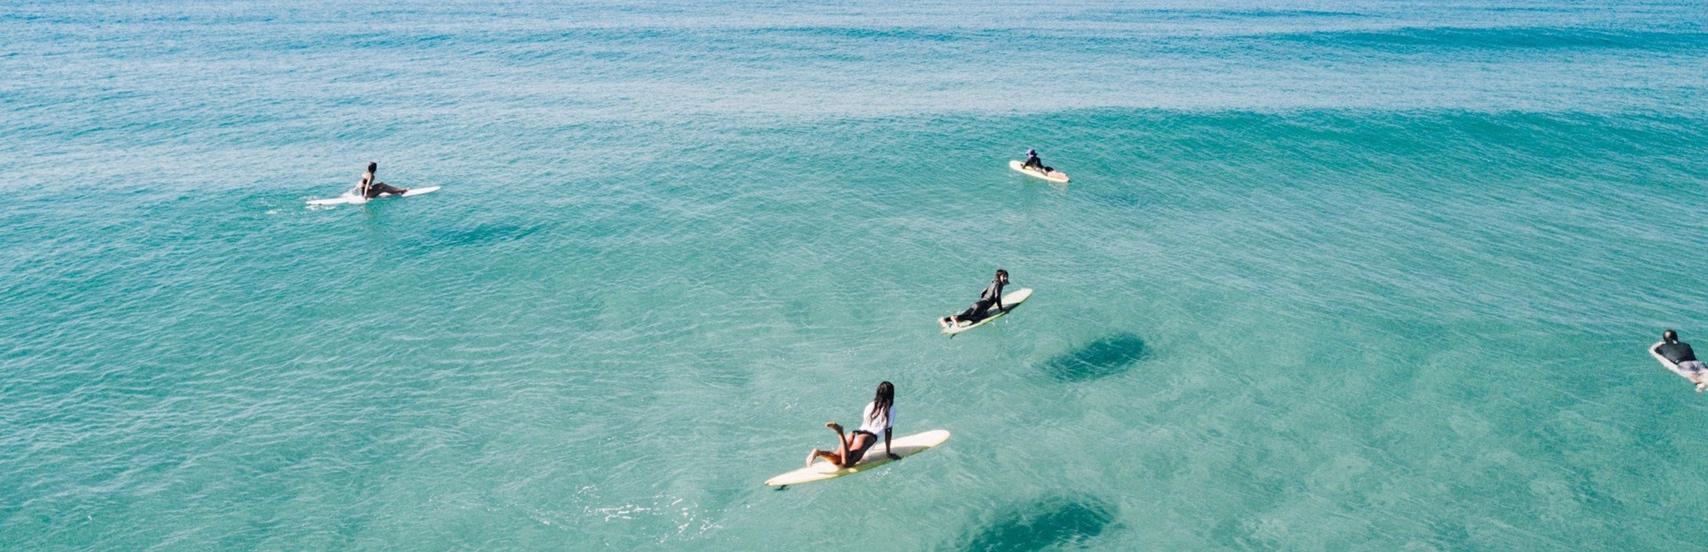 surf & yoga lifestyle retreats -